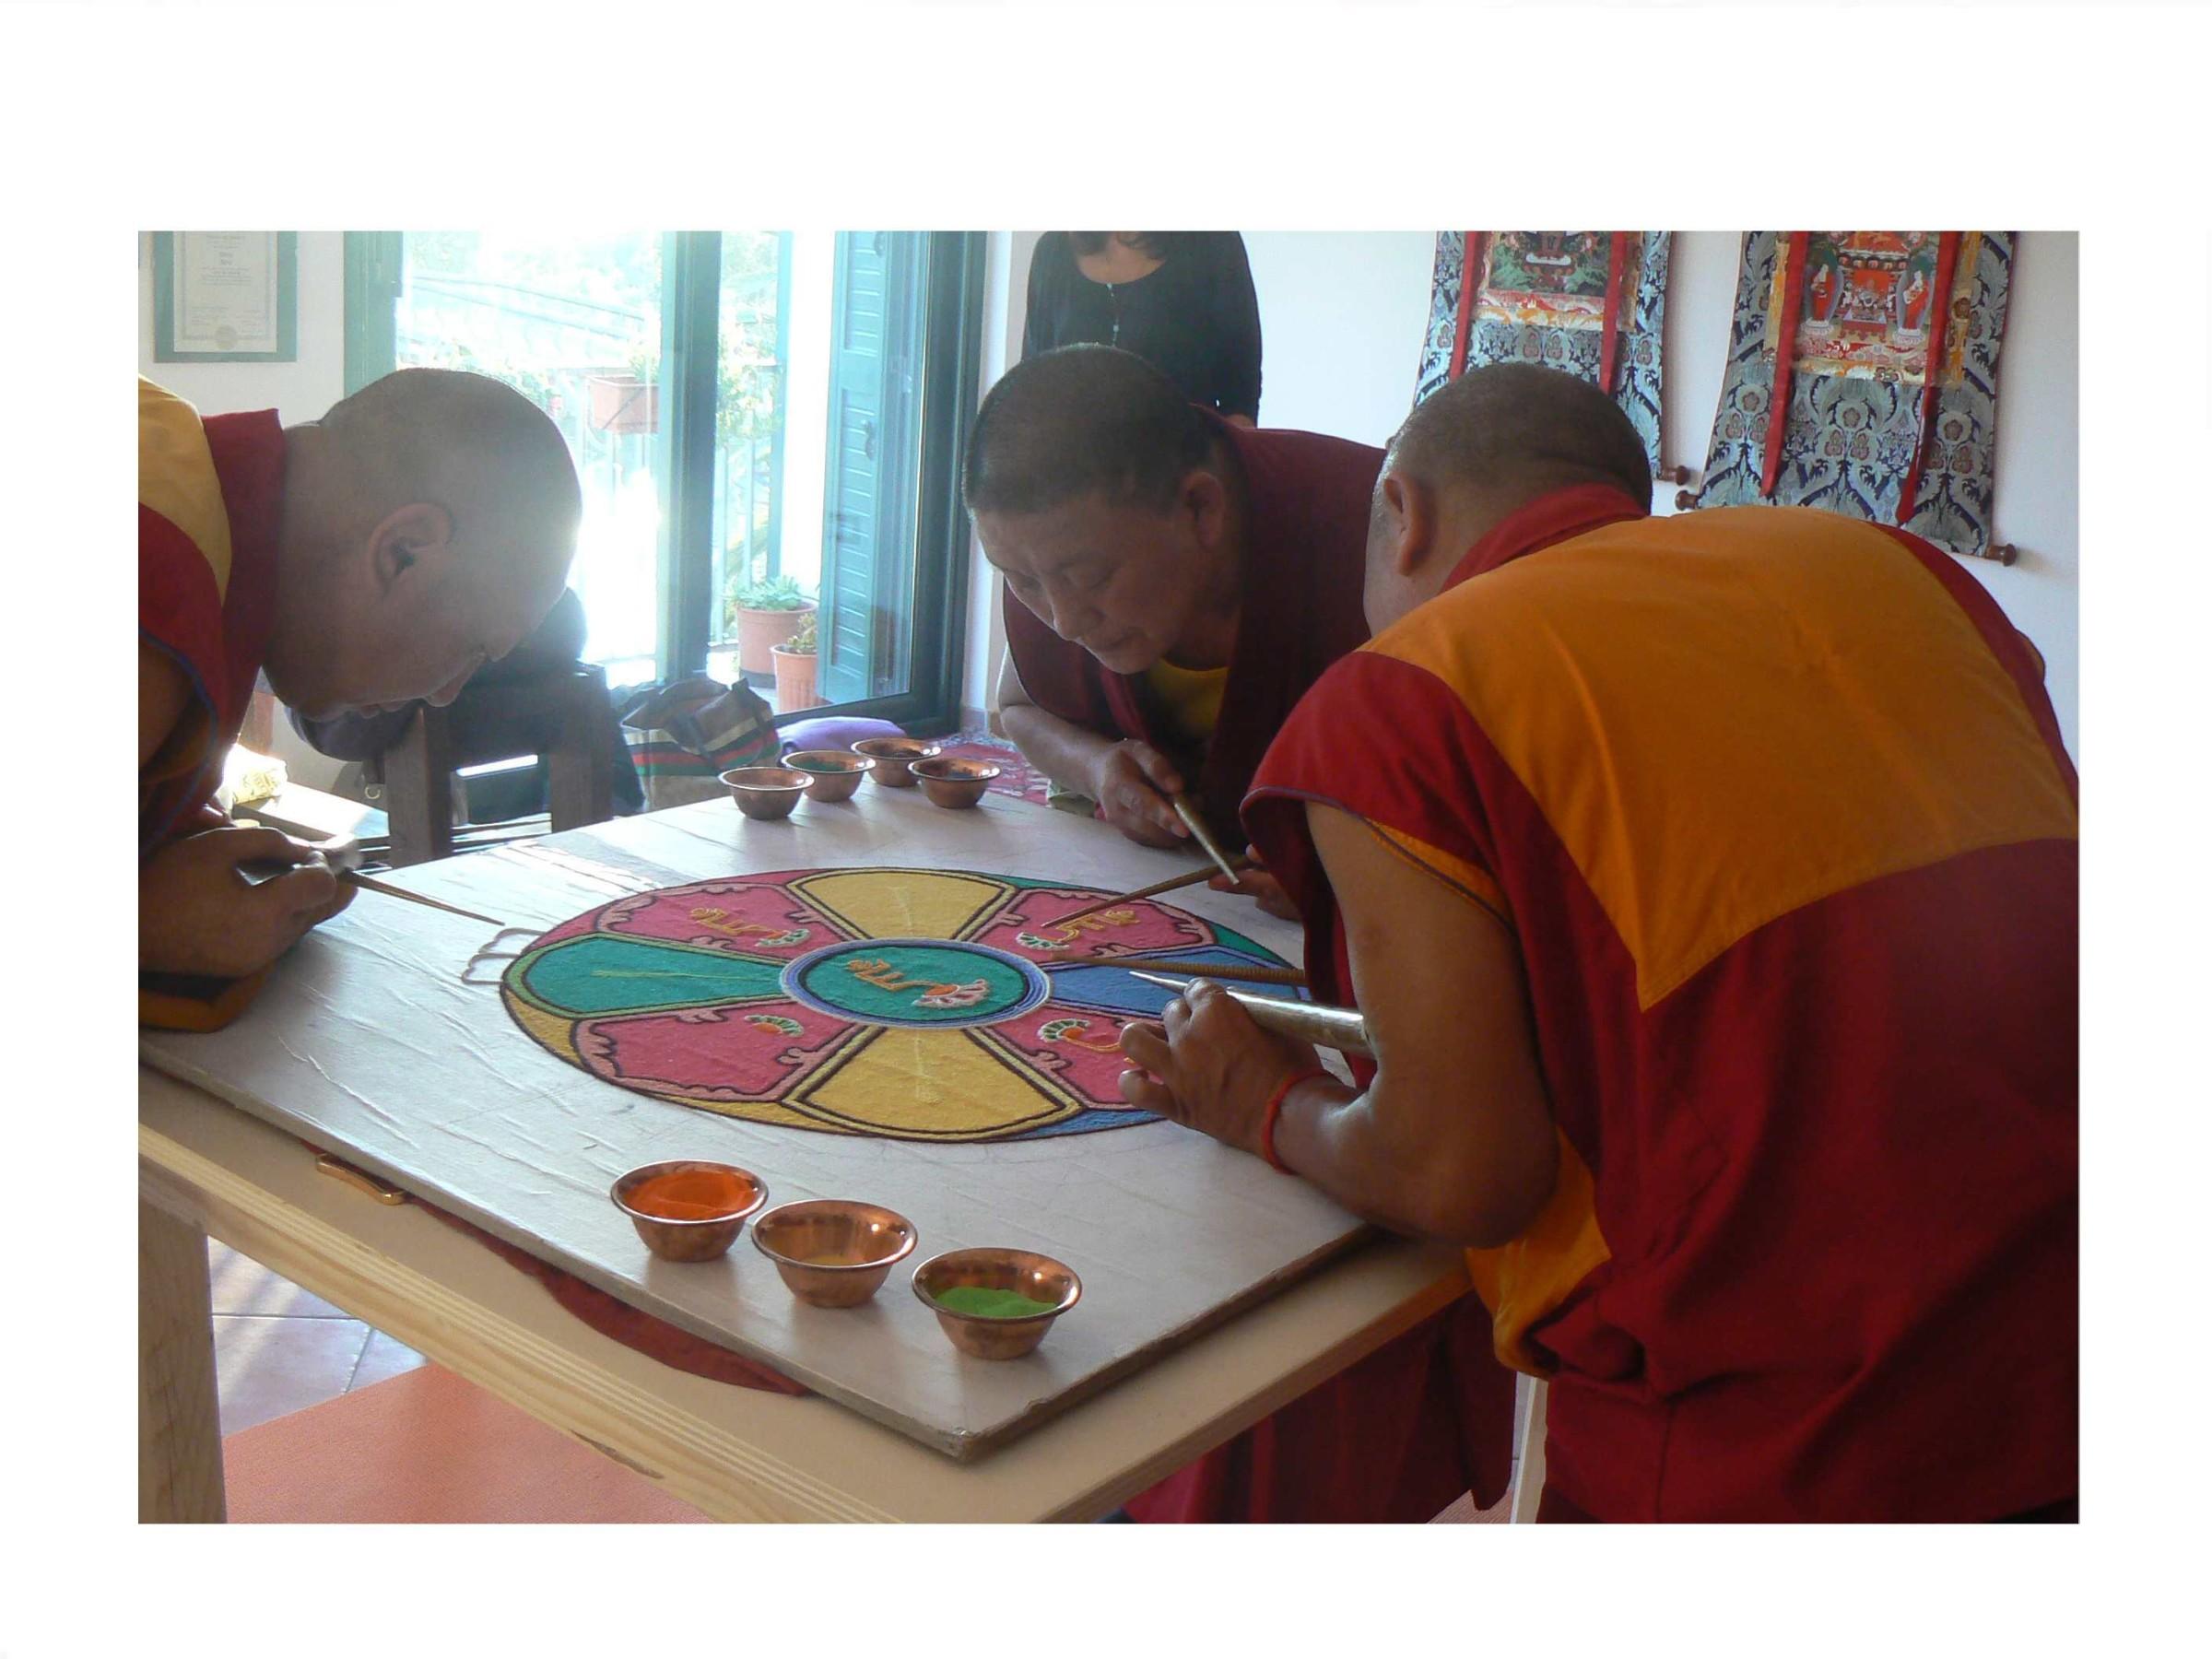 tibetani e piemonte 030